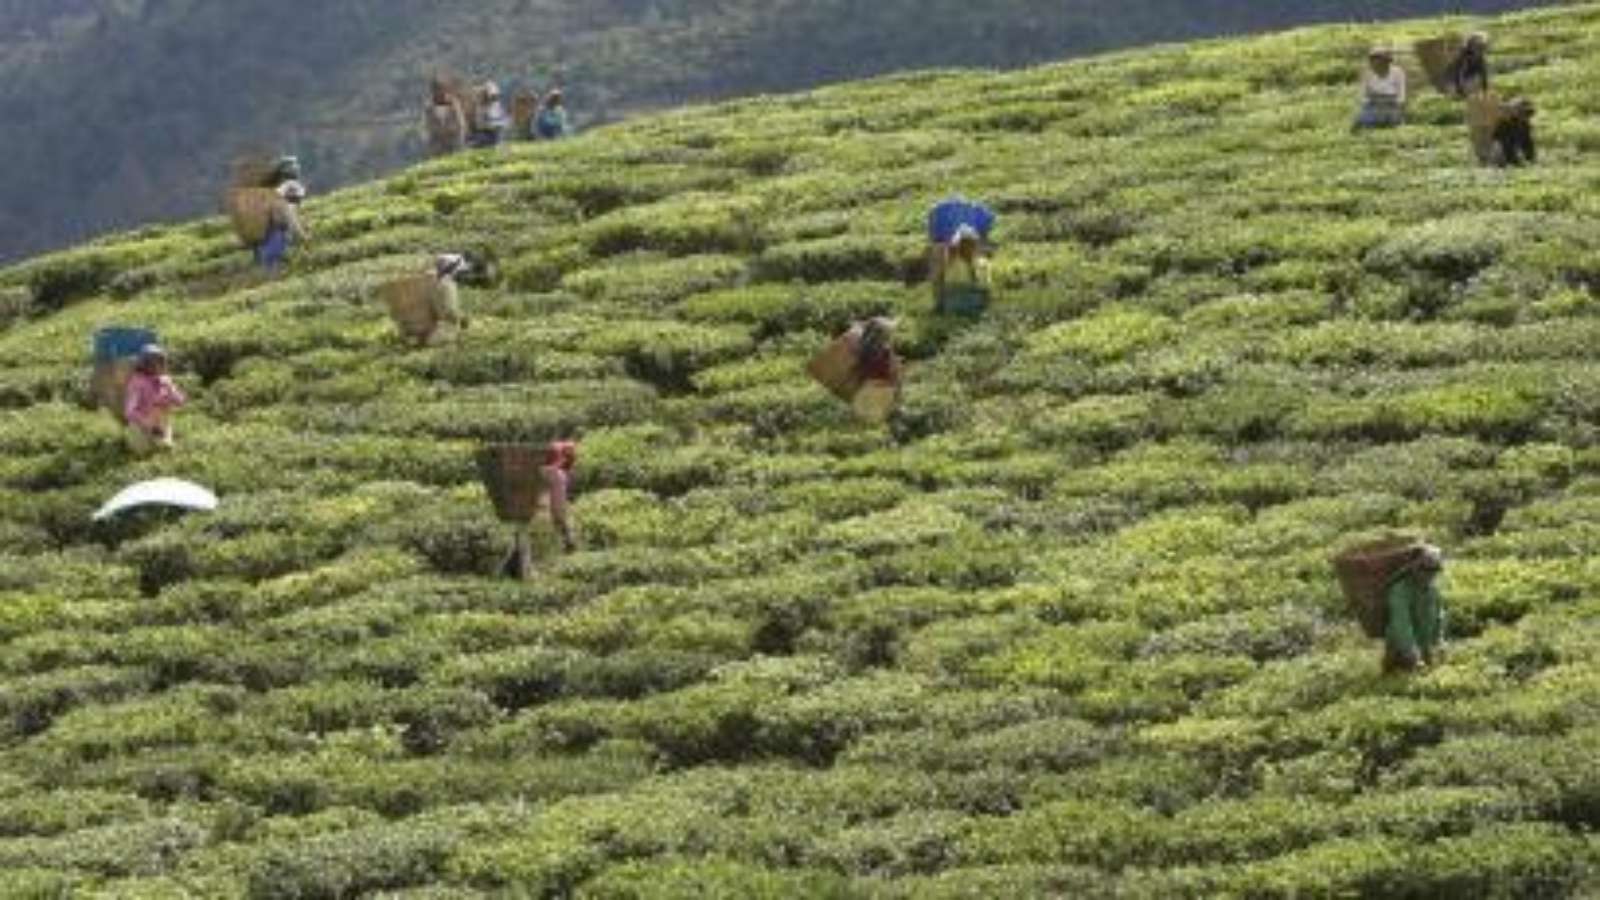 Sikkim-India-Organic state-Narendra Modi-Organic Farming-Farming